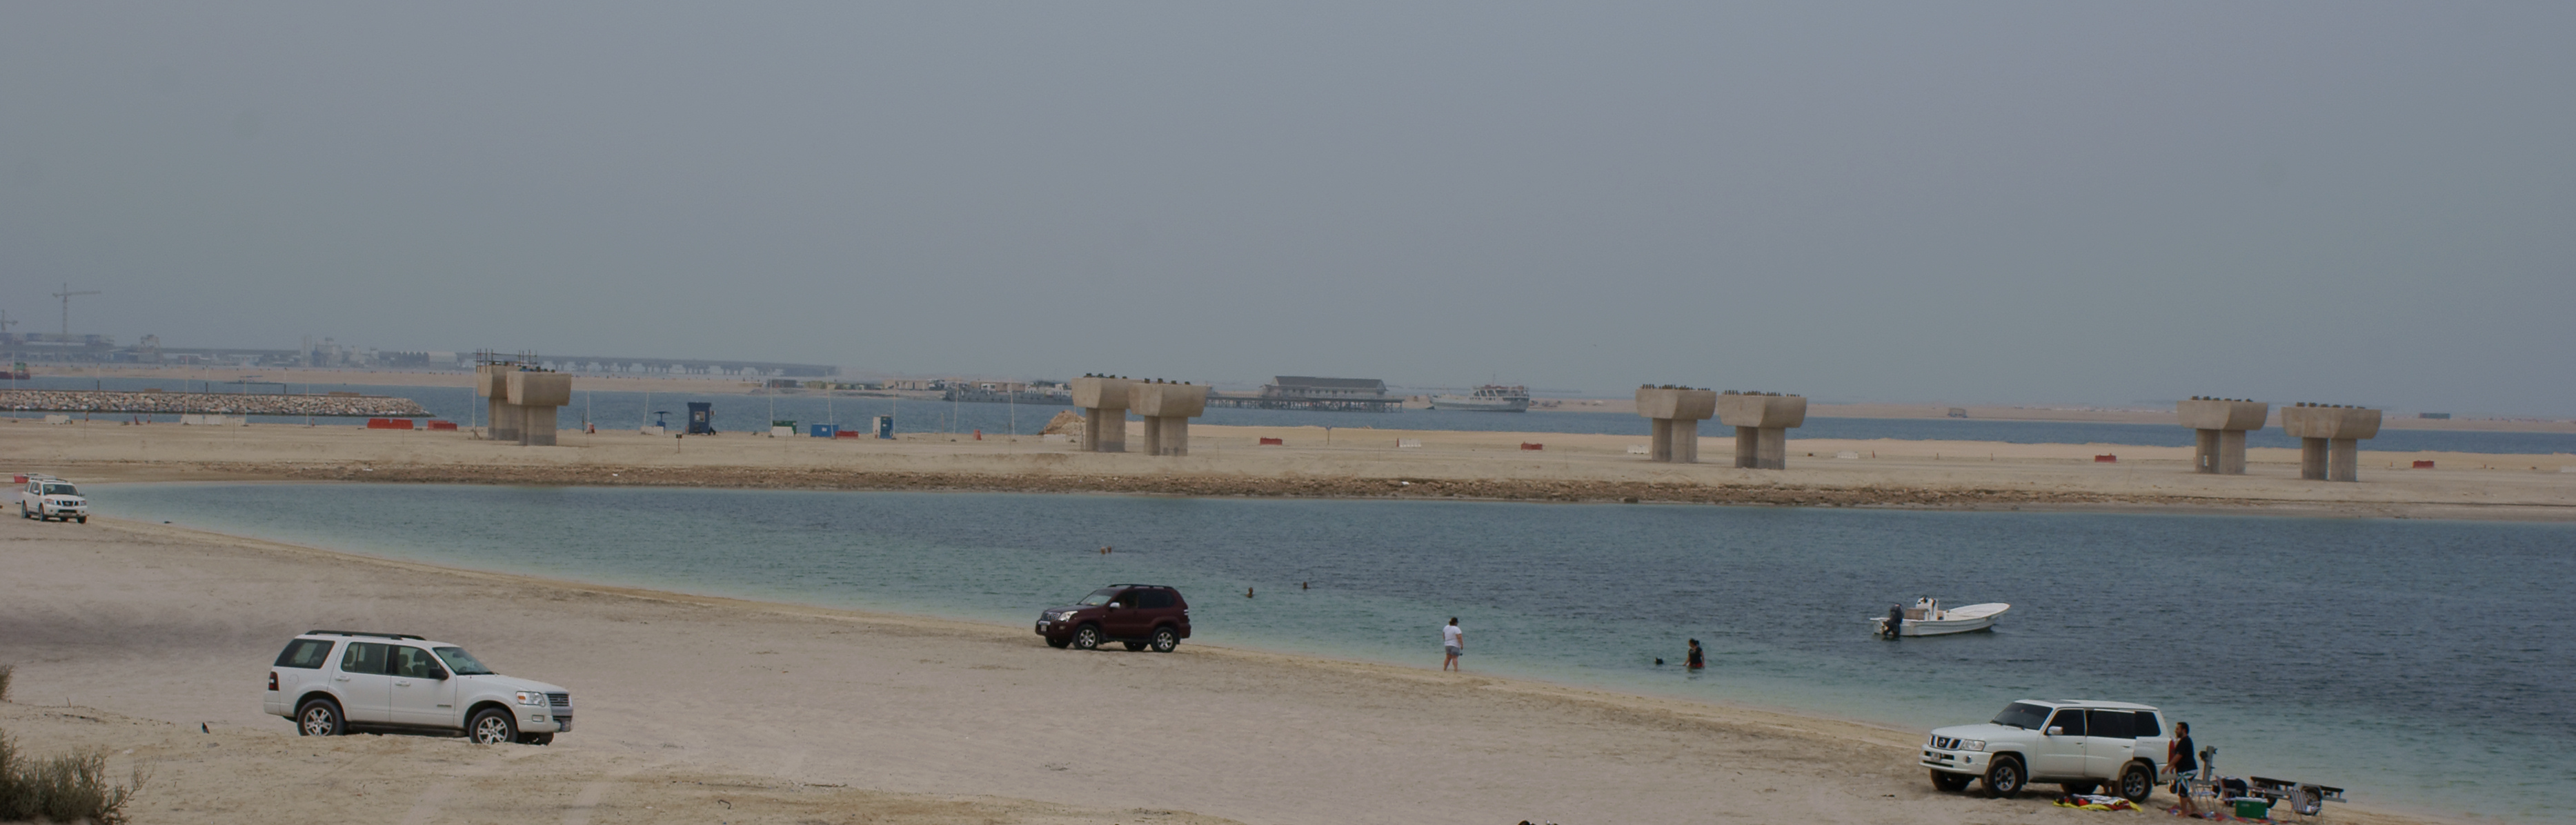 Jebel Ali Beach Dog Friendly